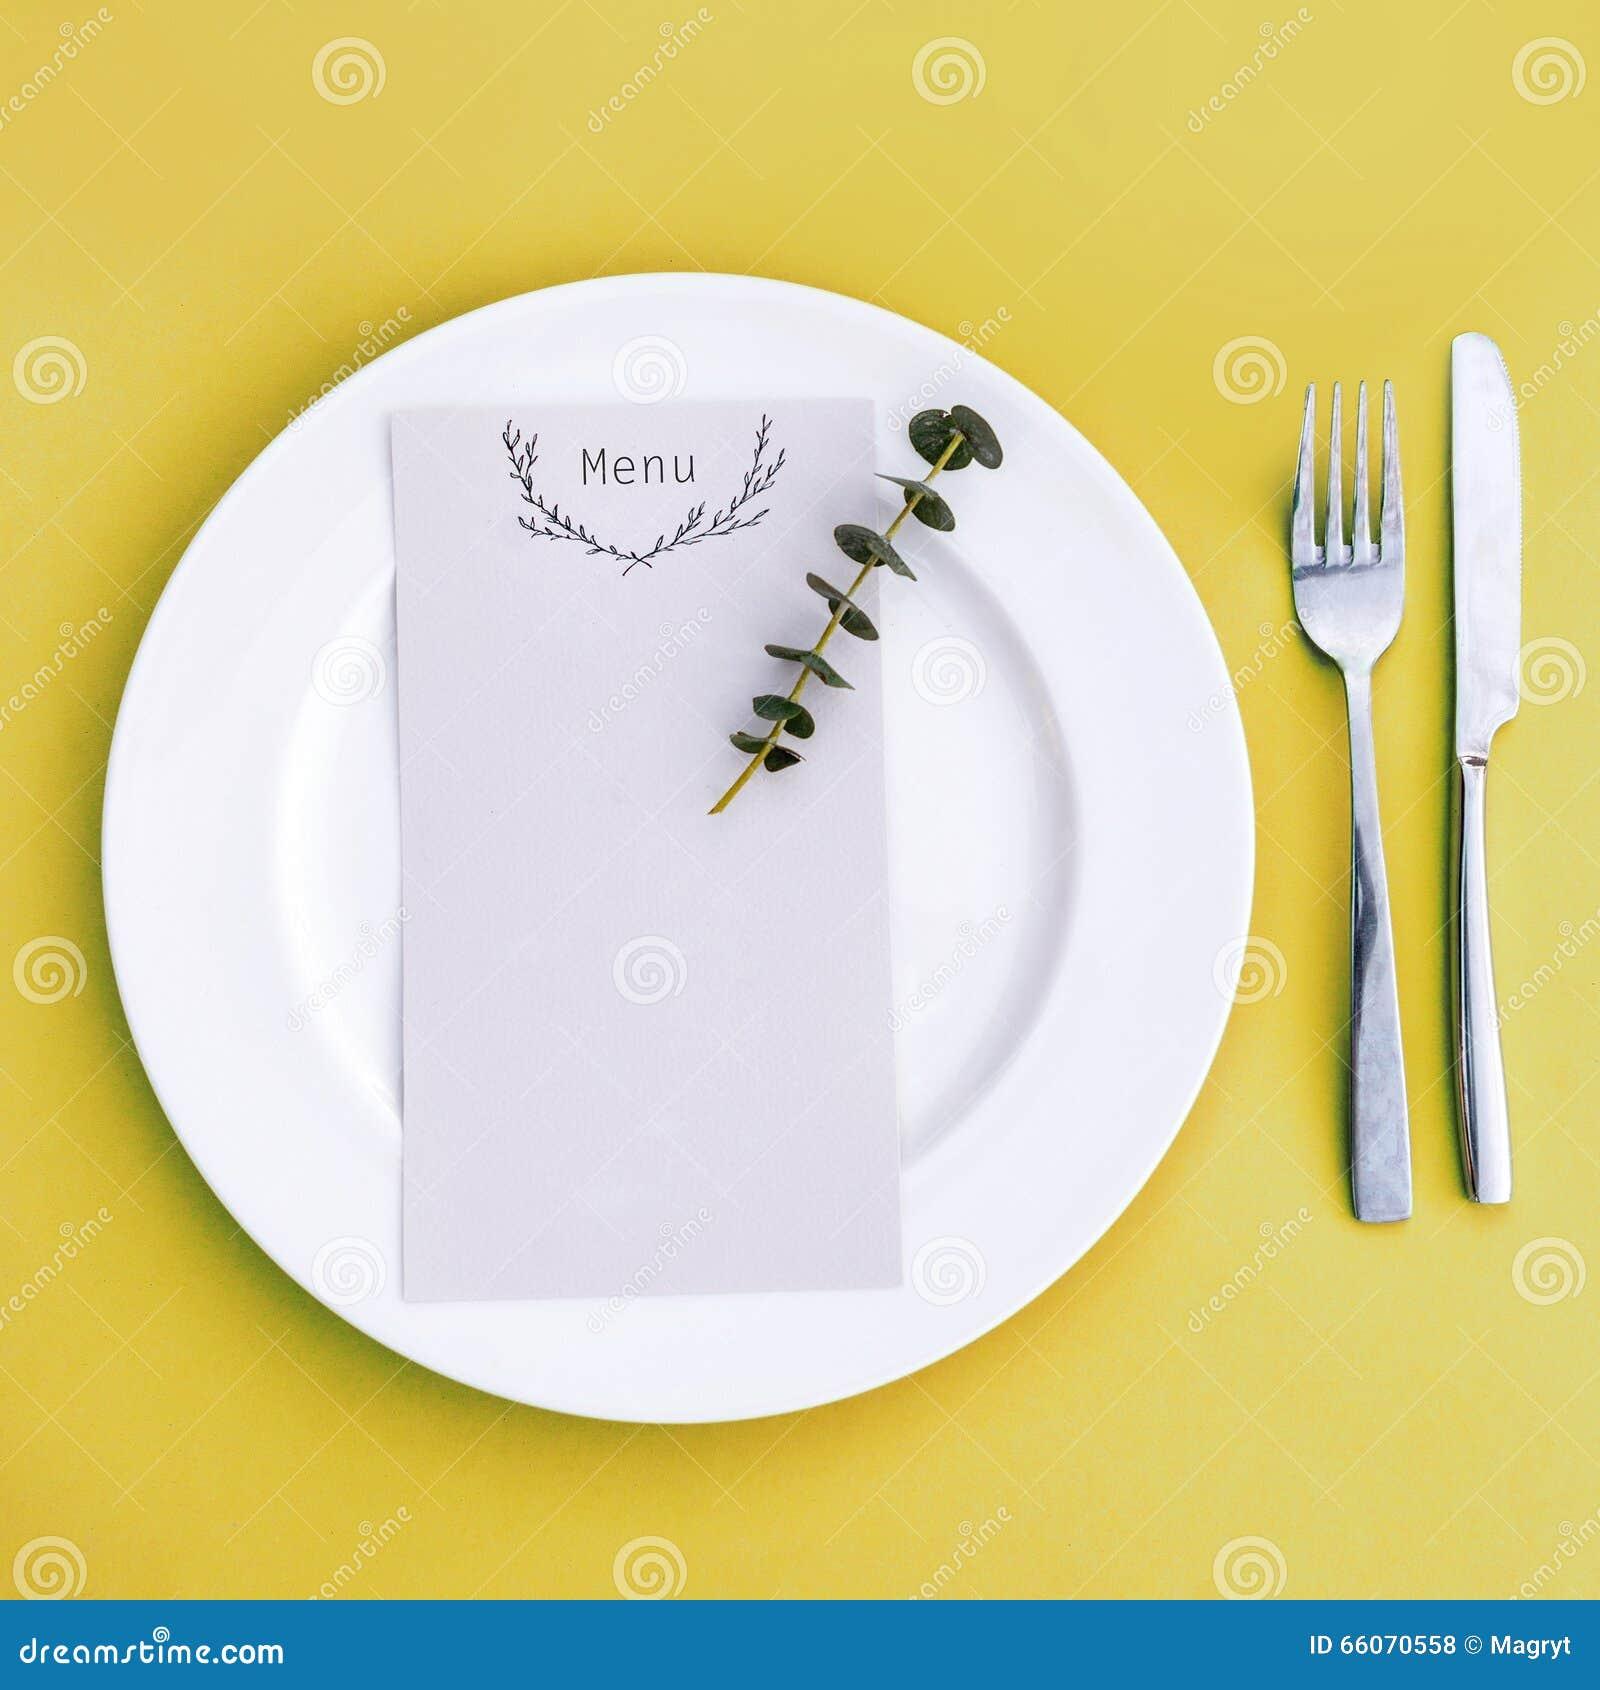 wedding dinner menu